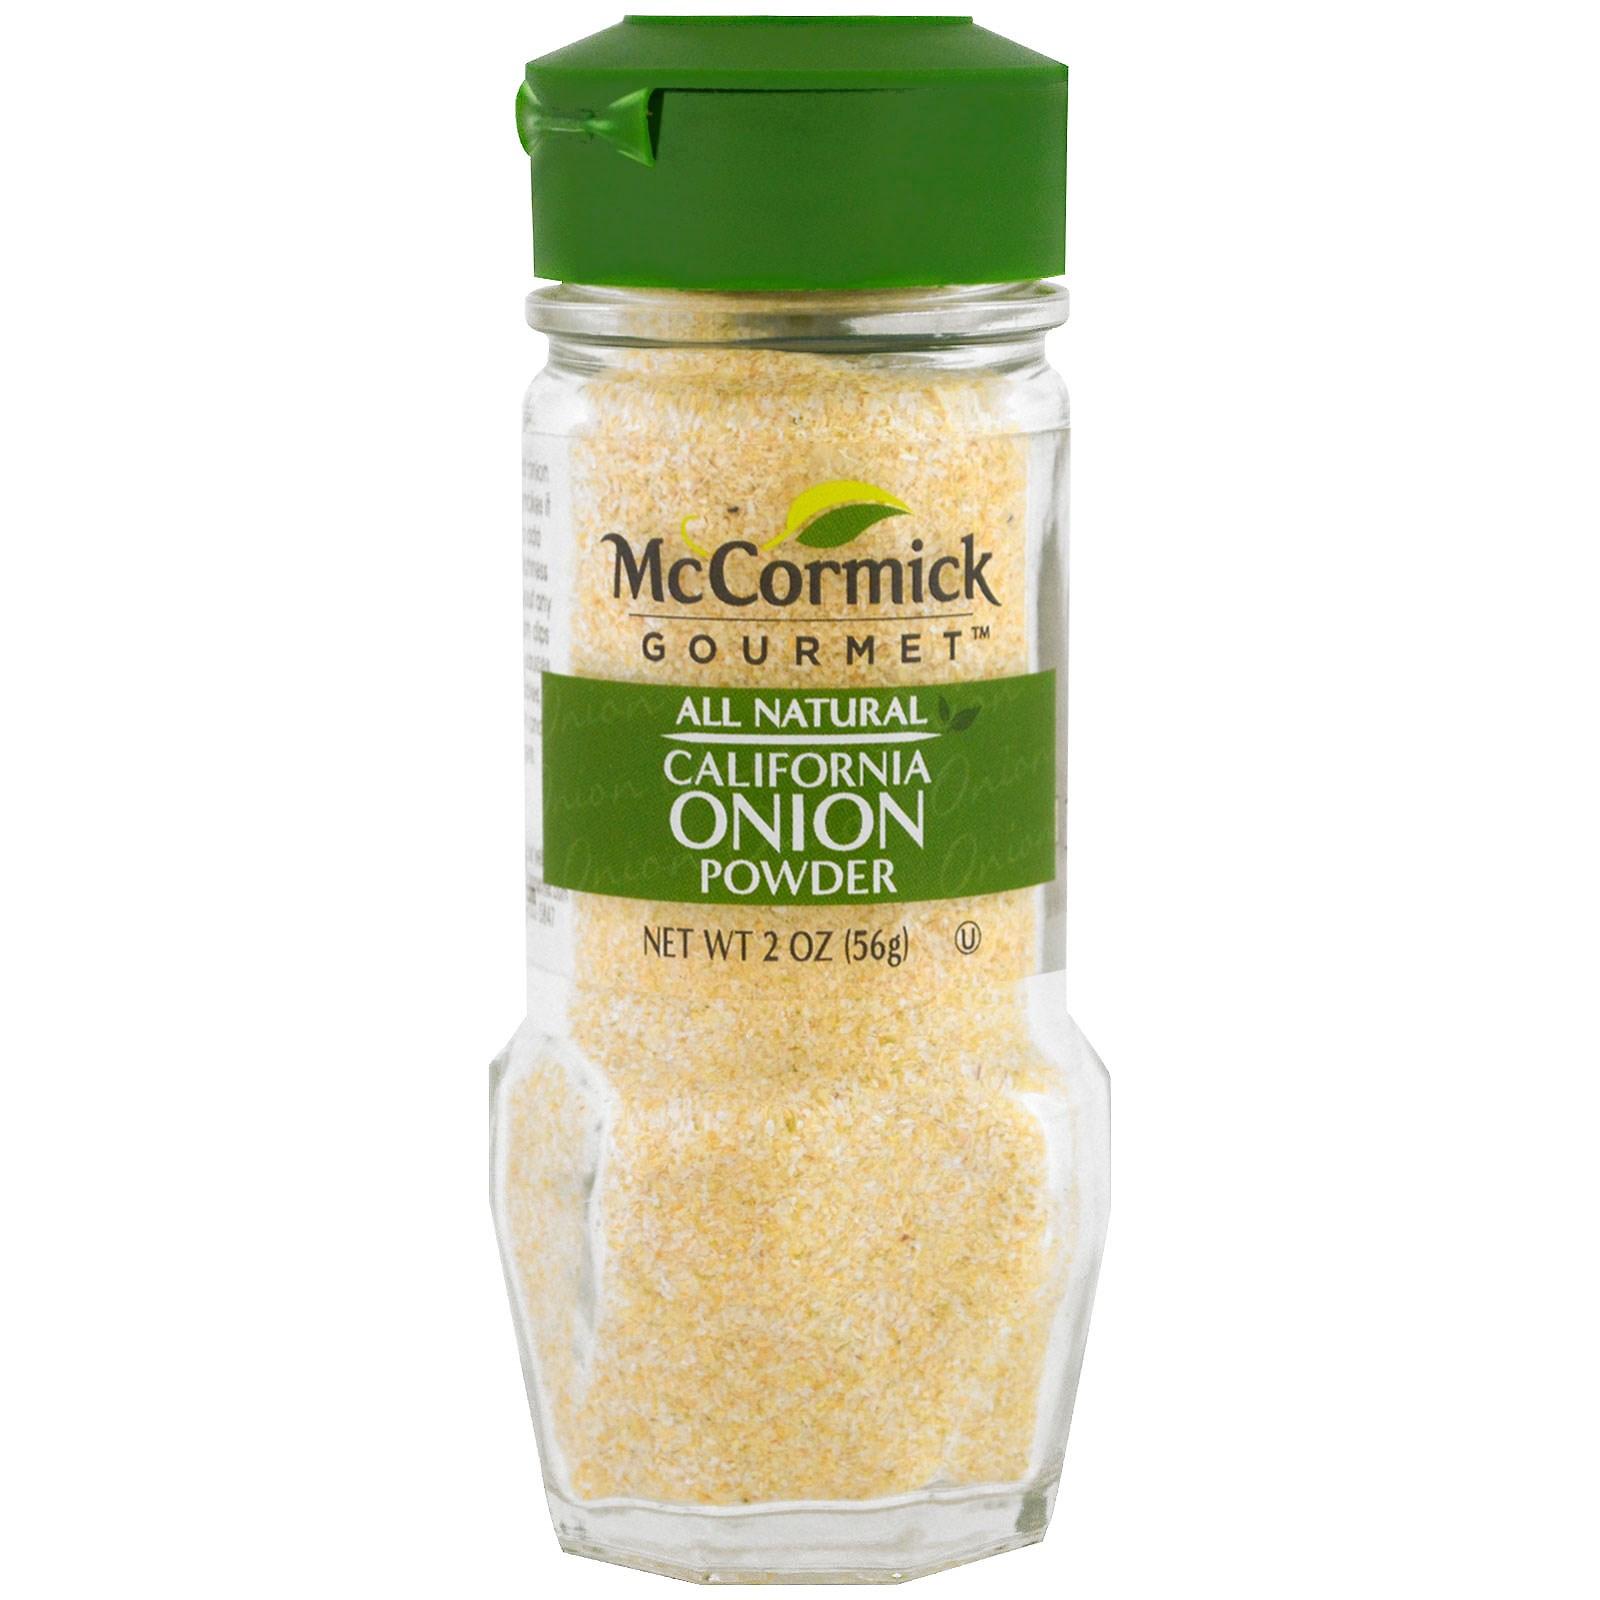 McCormick Gourmet, All Natural, молотый лук 2 унц. (56 г)